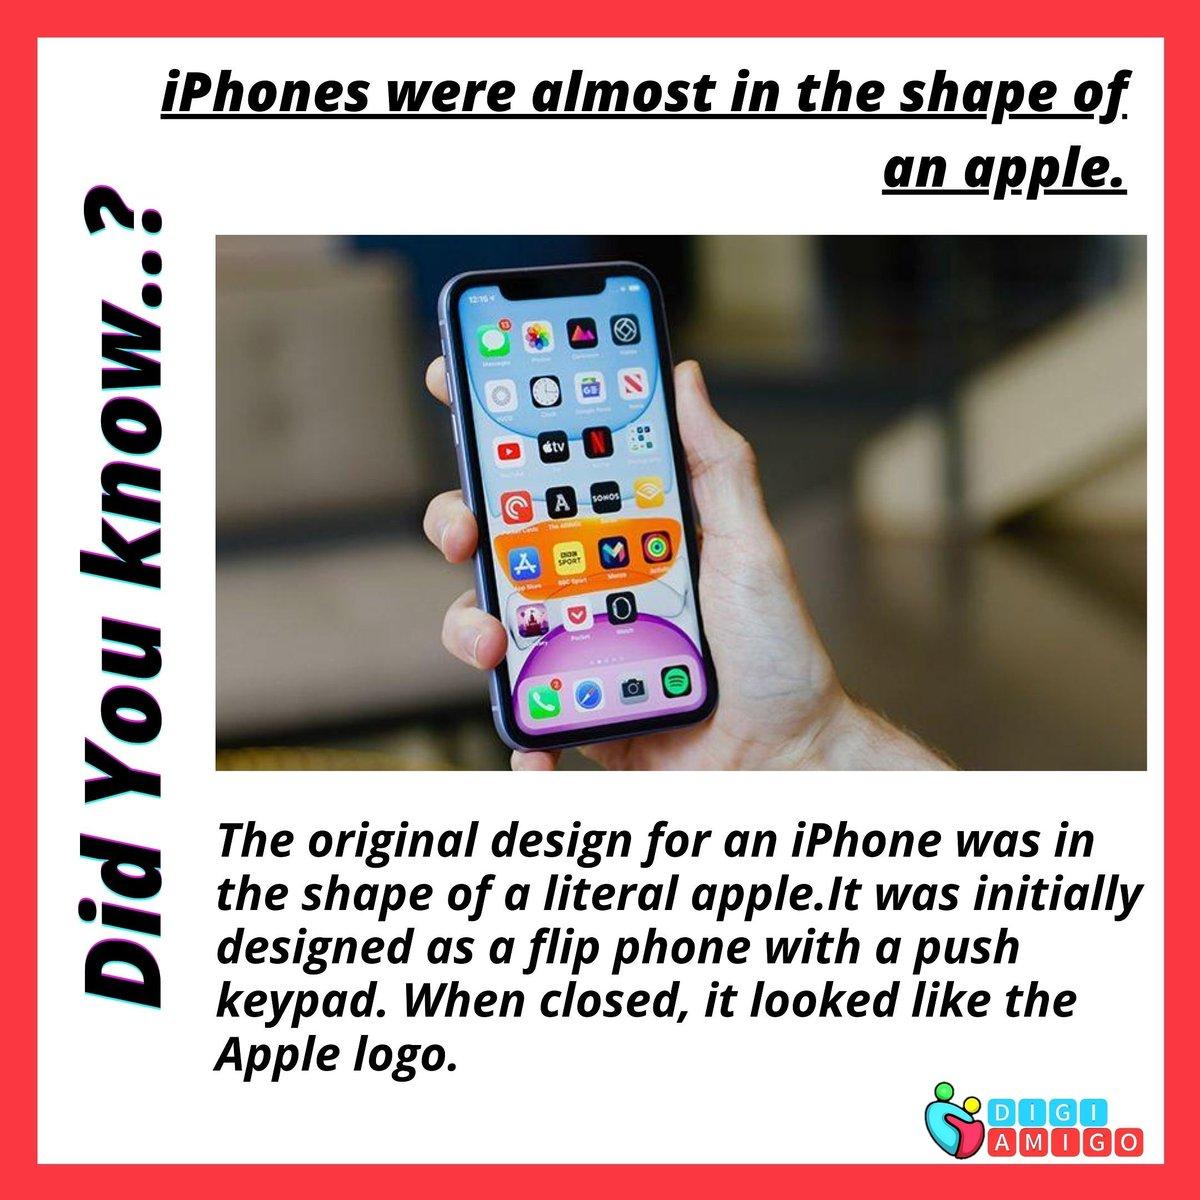 Communication is the key.    #iphone #gadgets #technews #tech #techy #techie #electronics #handphone #instatech #smartphone #plus #gadget #oppo #apple #samsung #vivo #instagood #android #gadgetmurah #device #mobile #gadgetshop #phone #xiaomi #tagwagai #funnytext #technology #elepic.twitter.com/u2gpTbjNoU